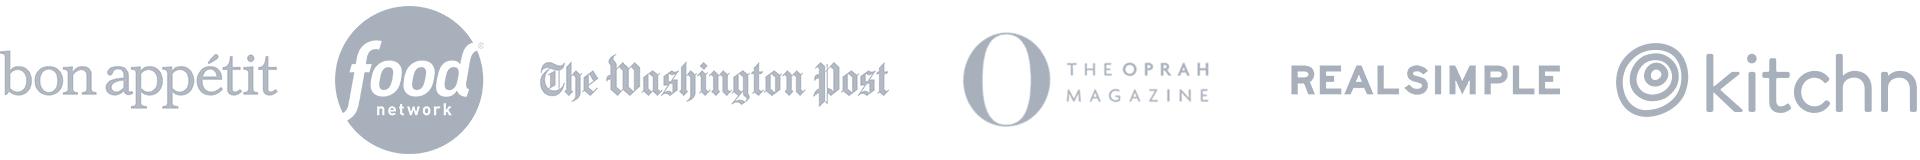 Logos: Bon Appetit, Food, Washington Post, Oprah Magazine, Real Simple, Kitchn